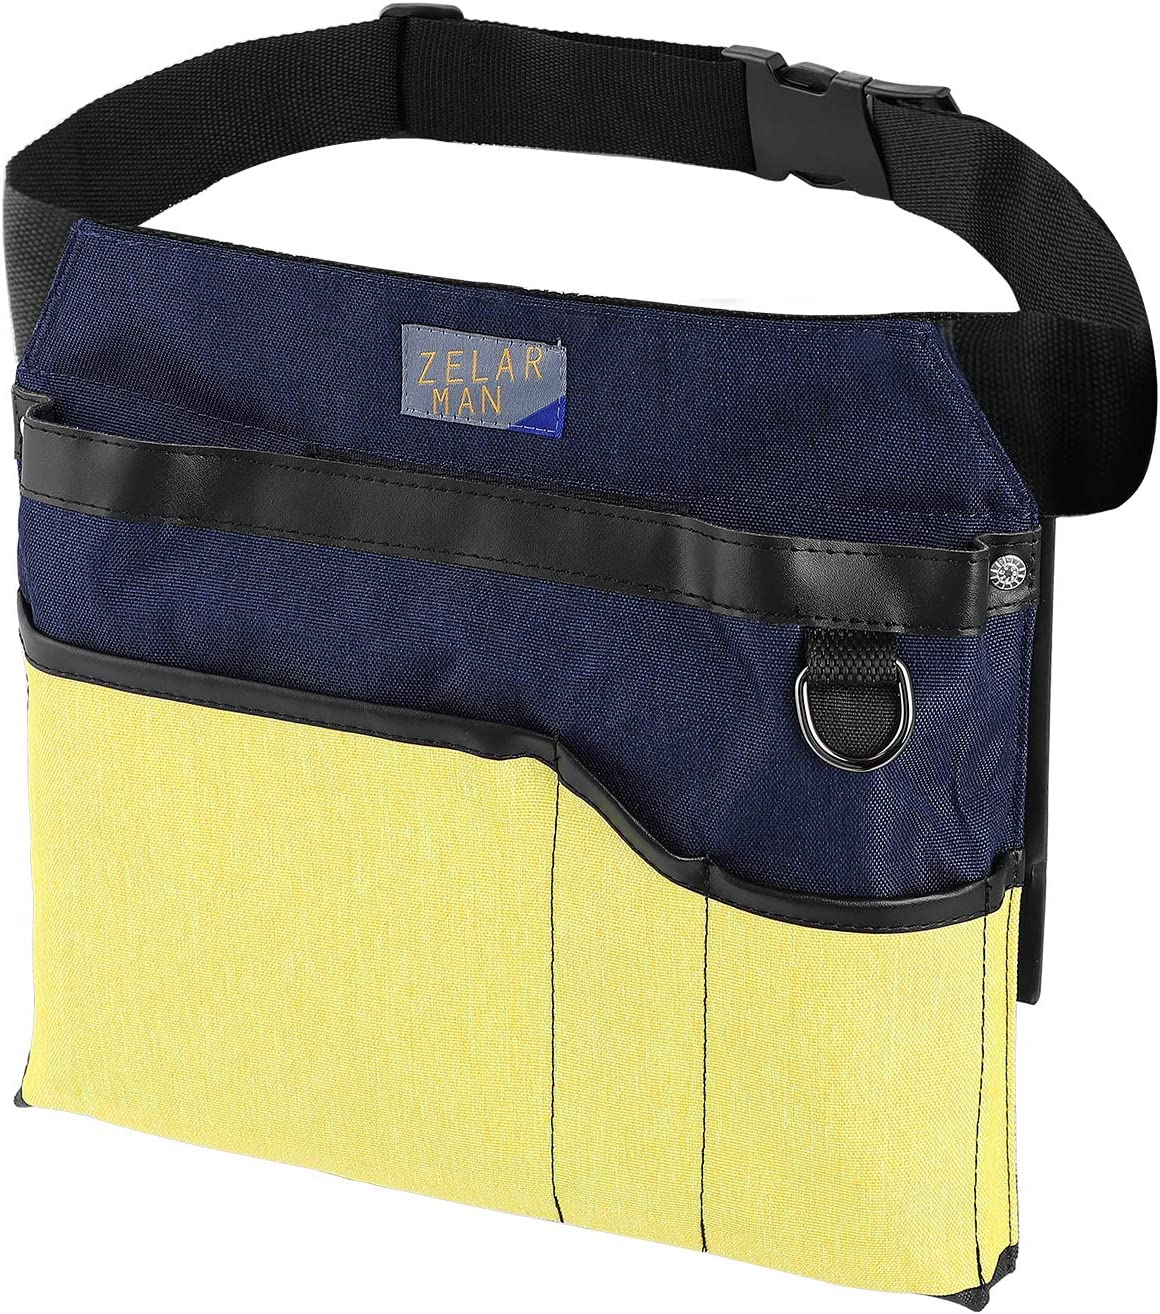 Gardening Tool Belt/Apron, 4-Pocket Utility Tool Waist Pouch Belt, Unisex Garden Waist Bag with padding&Adjustable Belt(Blue&Yellow)